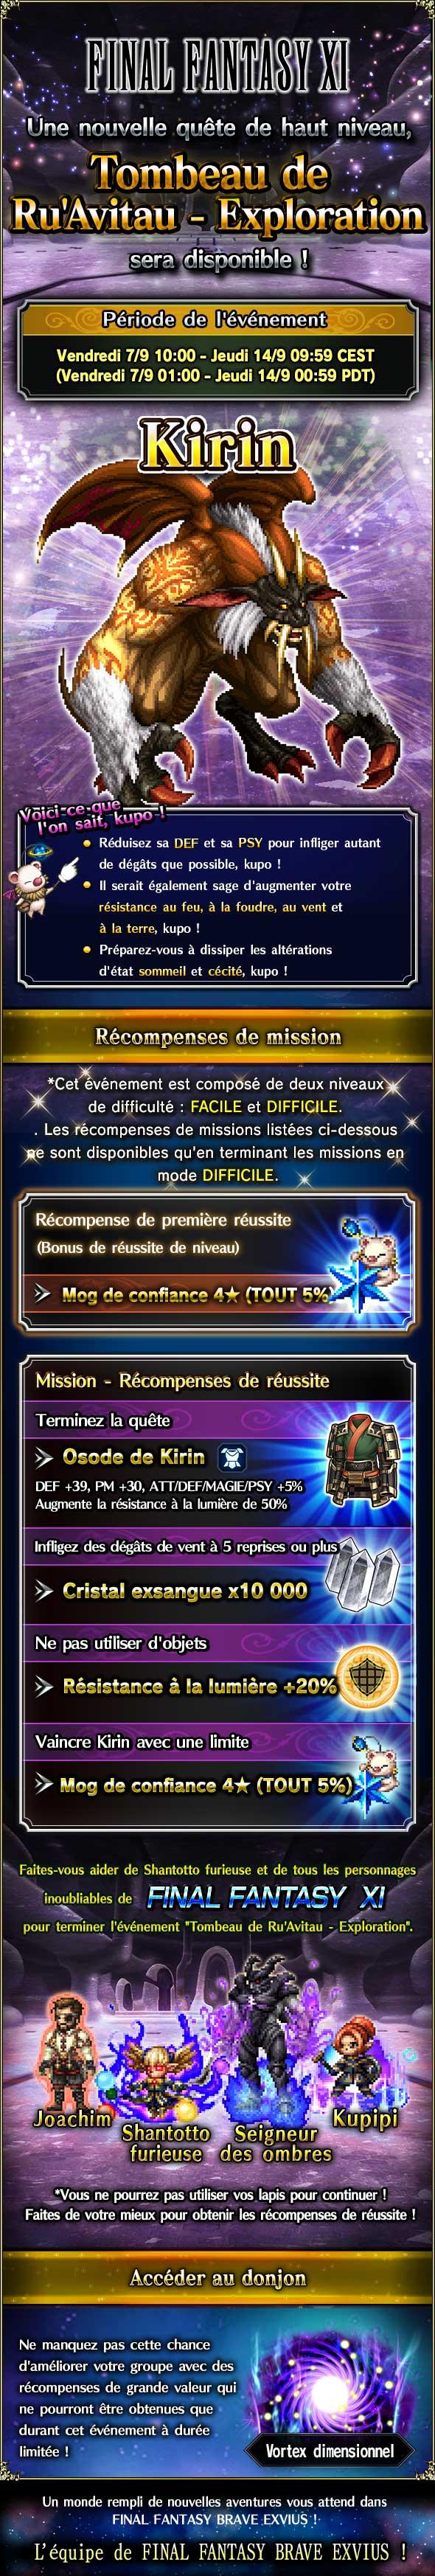 Trial MK FFXI - Tombeau de Ru'Aviteau (Exploration) - du 07/09/18 au 14/09/18 ShrineofRuavitau_Exploration